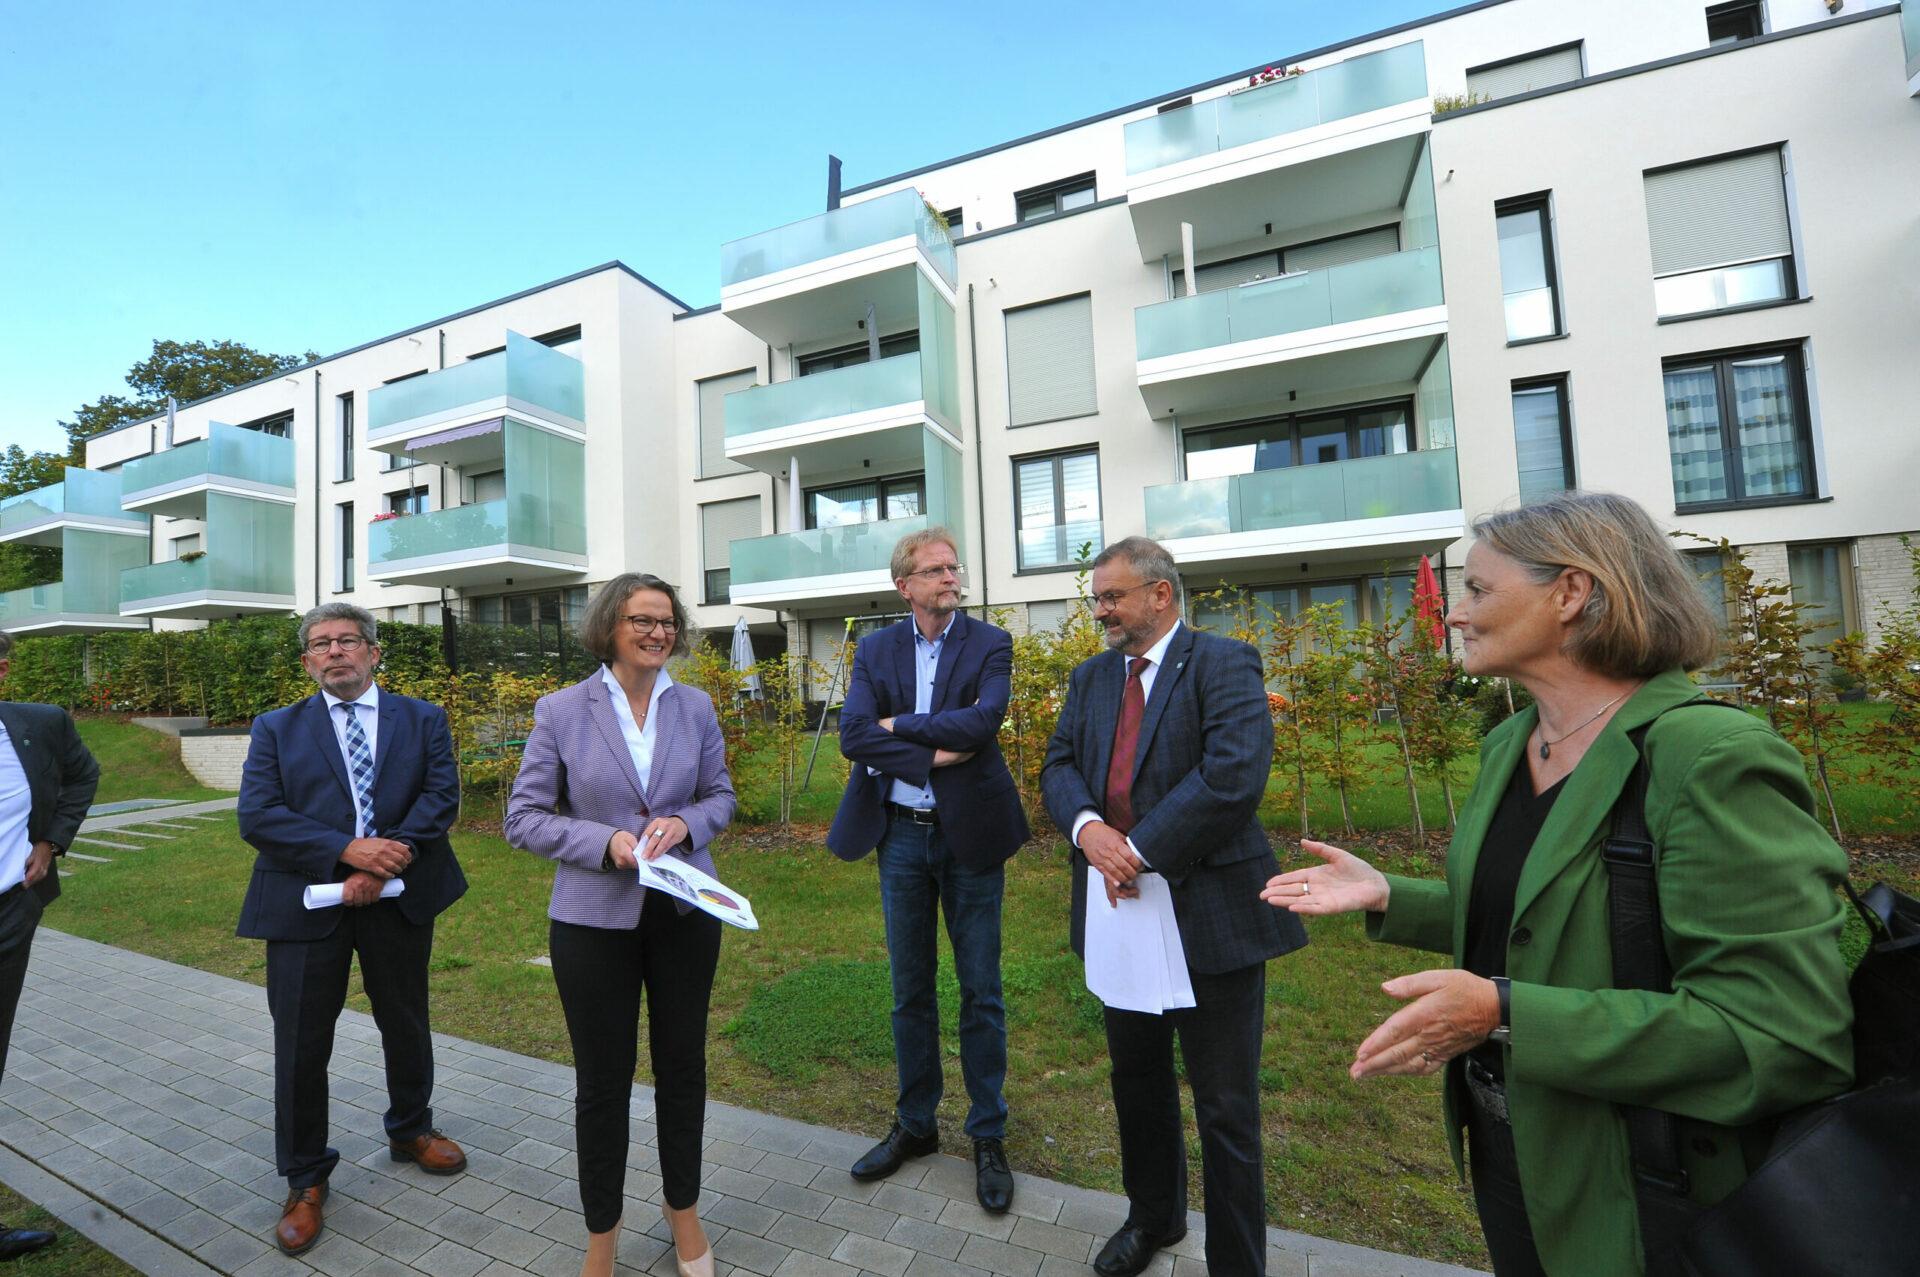 Bauministerin Ina Scharrenbach besucht GWG-Klimaschutzsiedlung